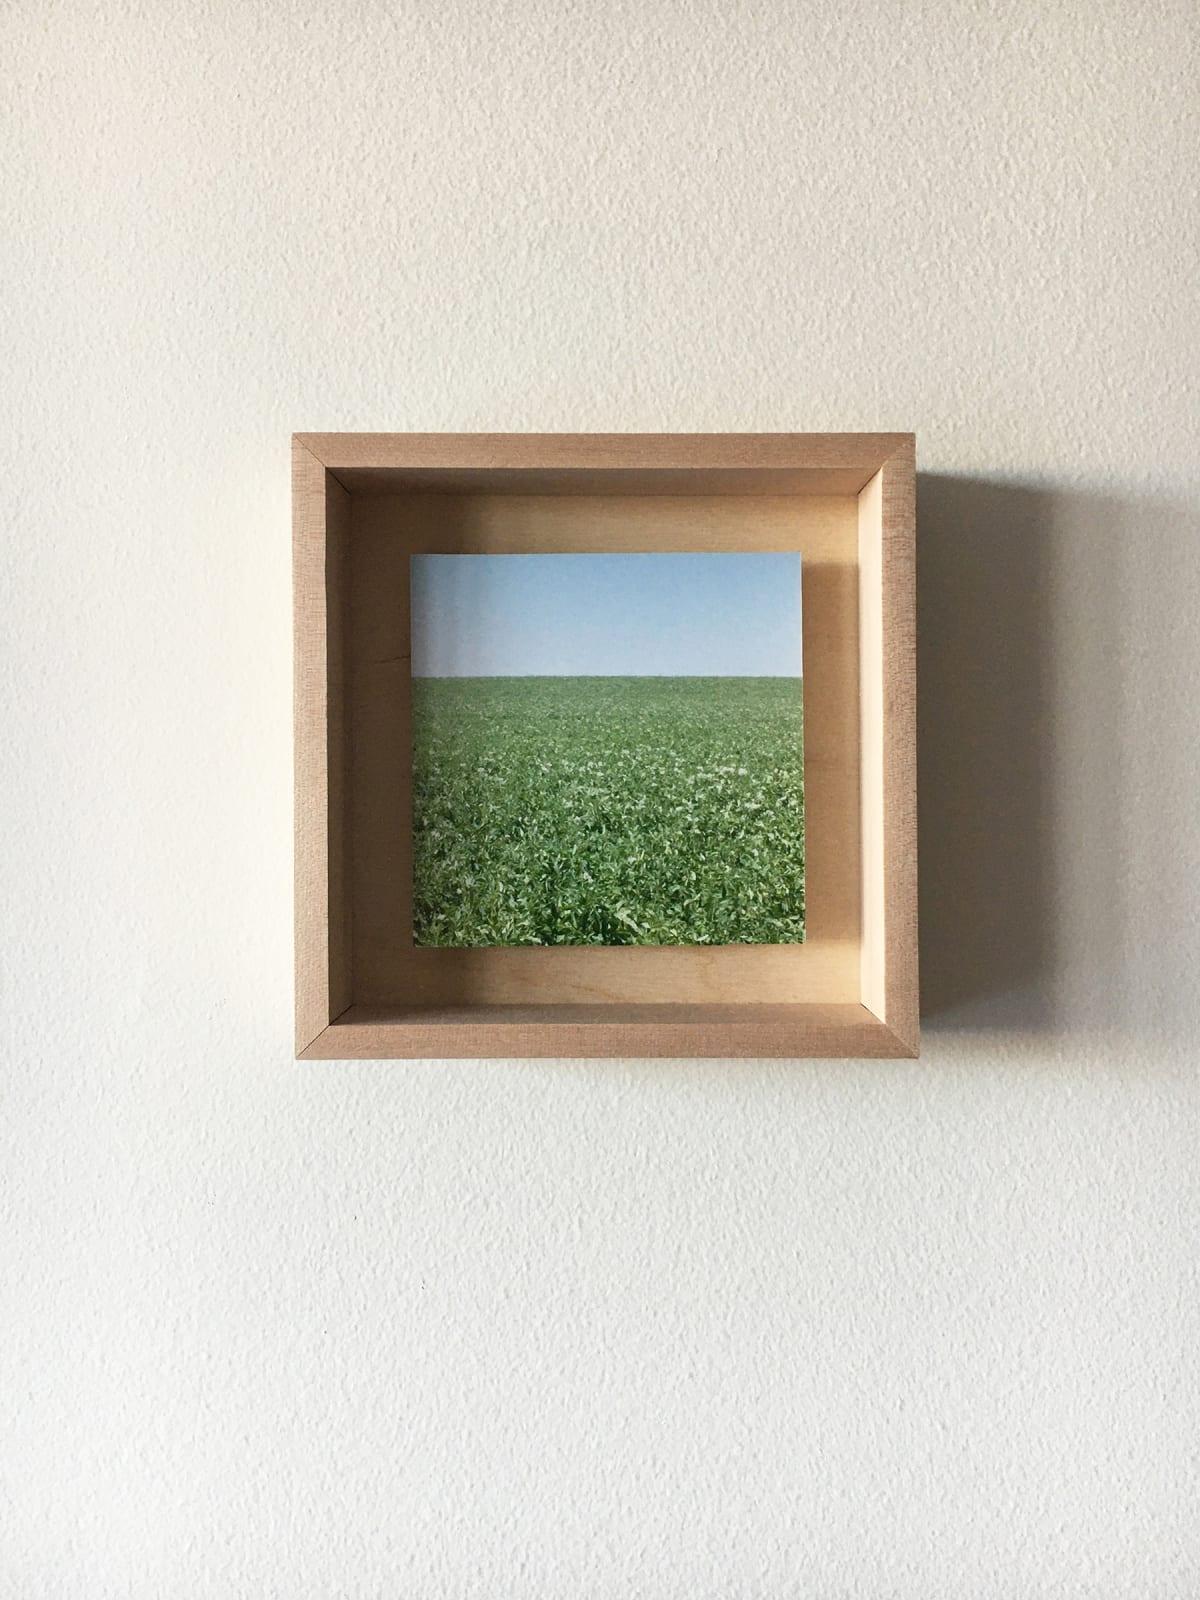 Grace Clark Sweet Fields II, 2020 digital pigment print 6 x 6 inches, edition 1/3 $ 500.00